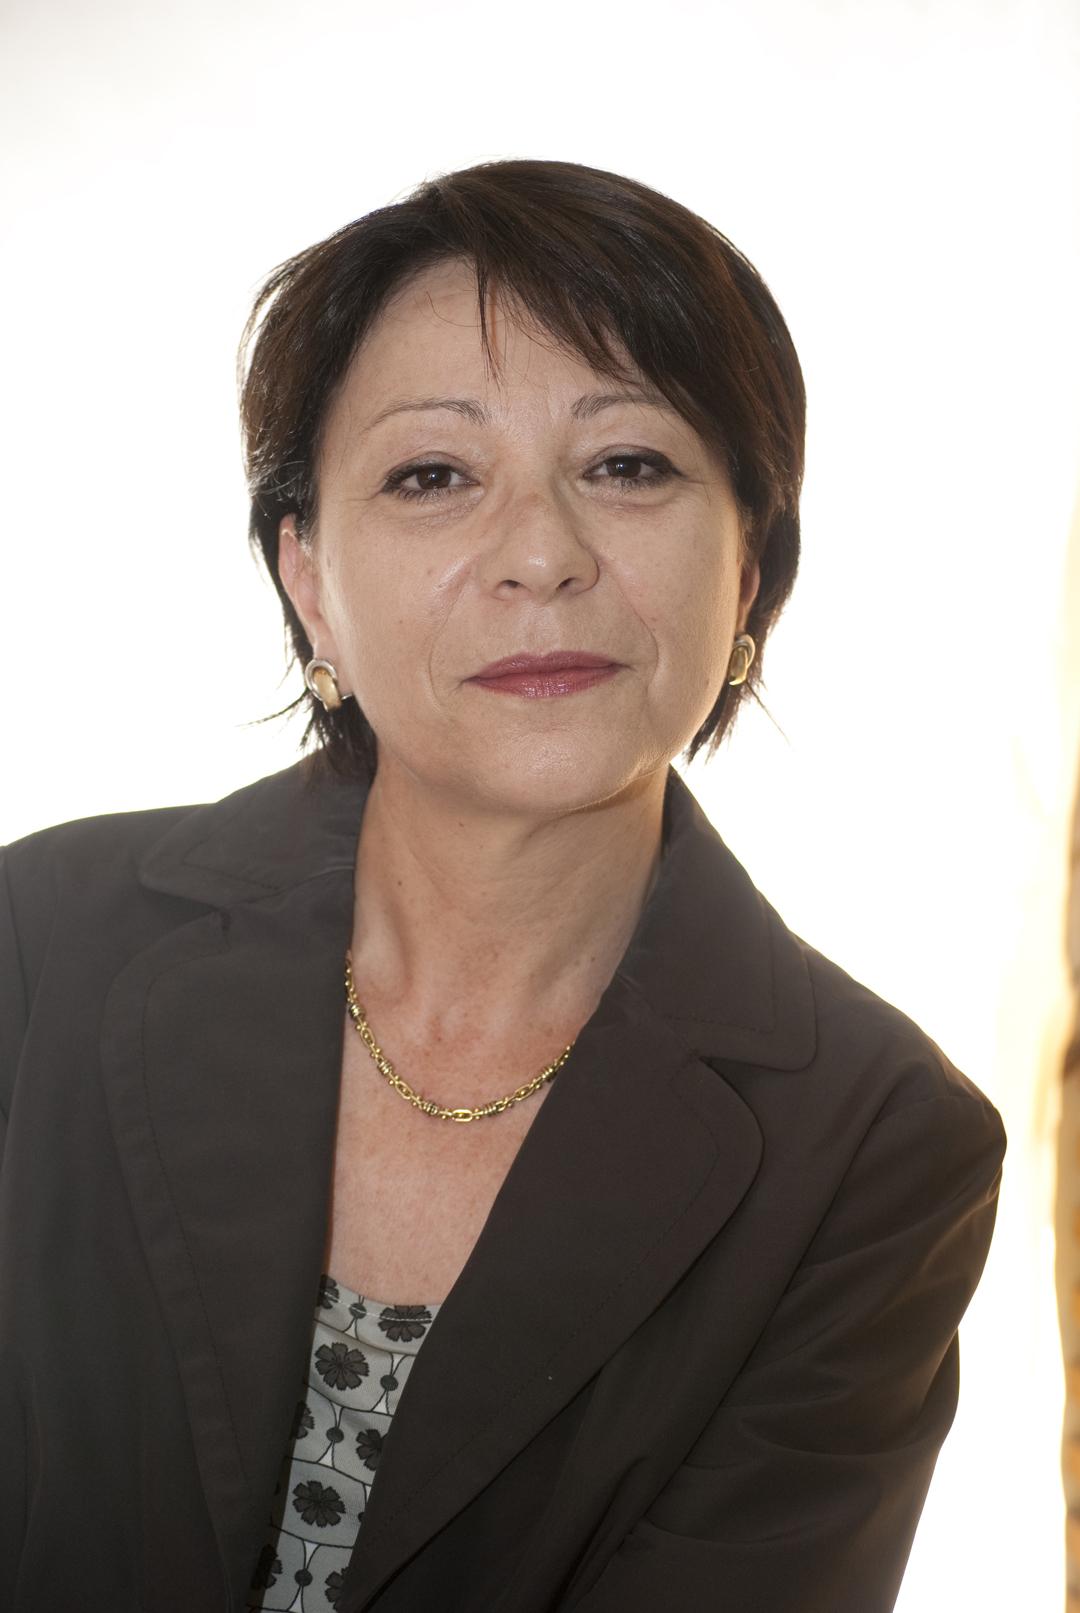 SIDDIVO' MARIA